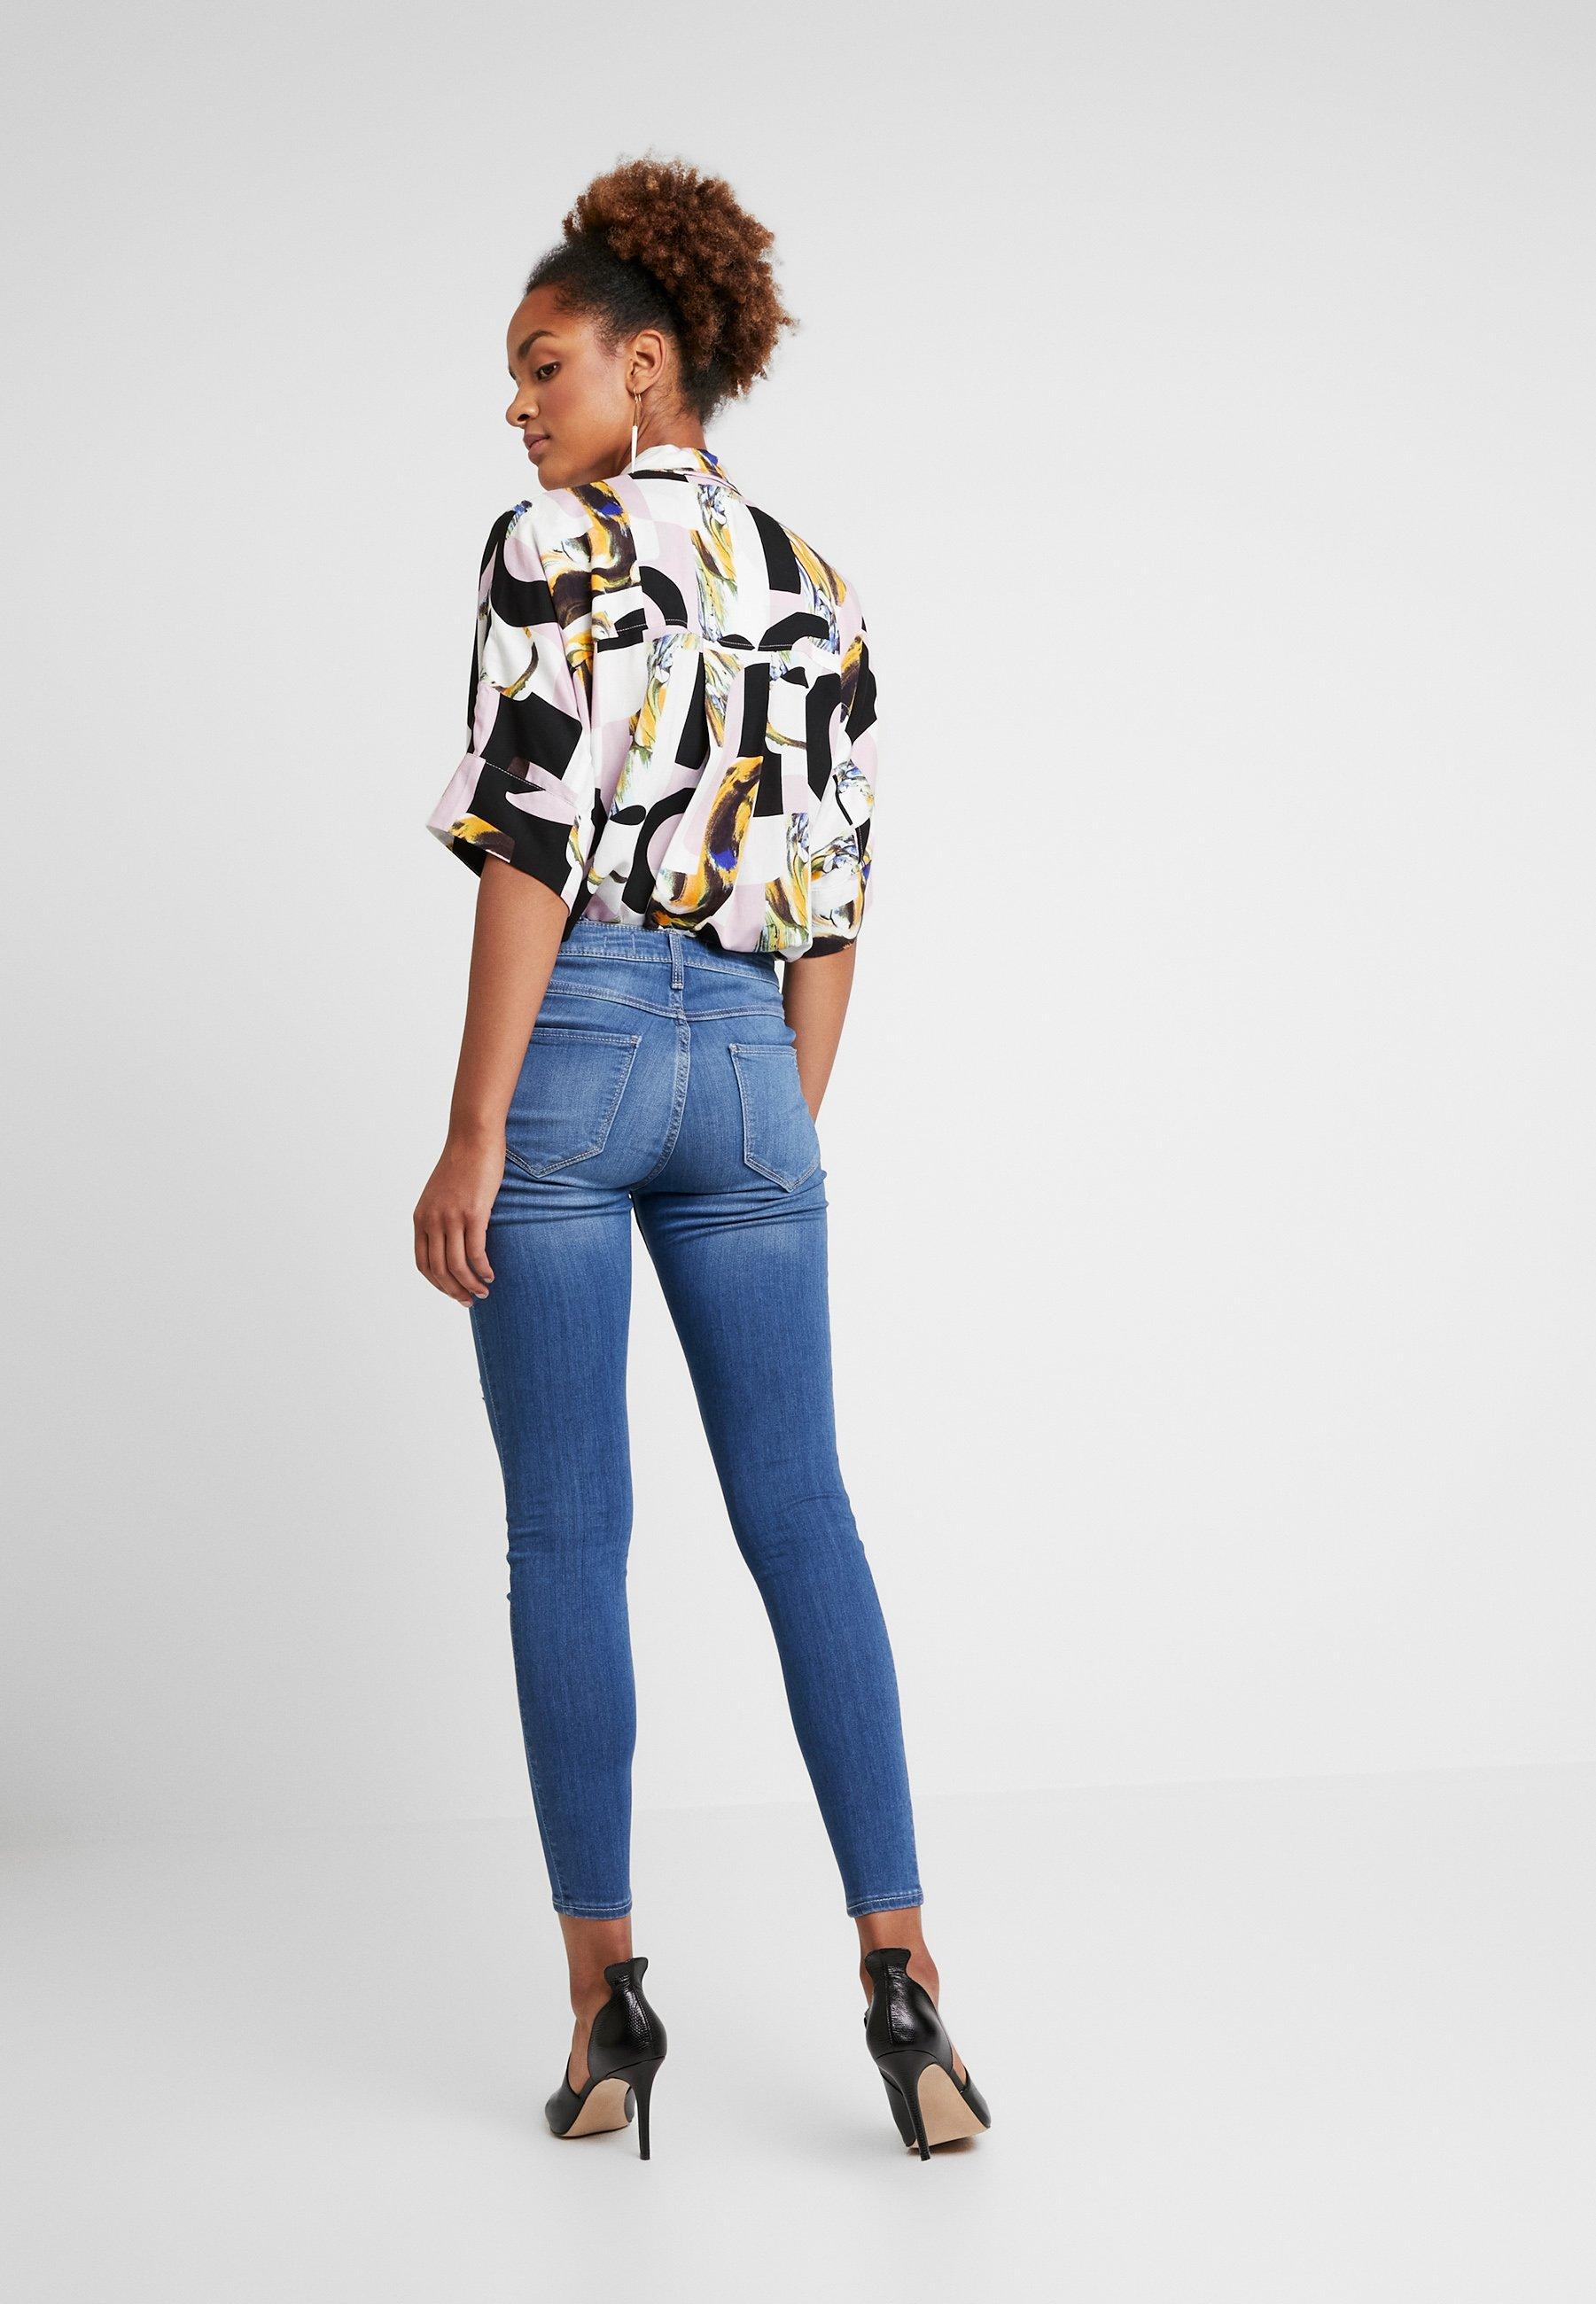 Hollister Denim Blue CoHigh RiseJeans Skinny NwyvnOm80P